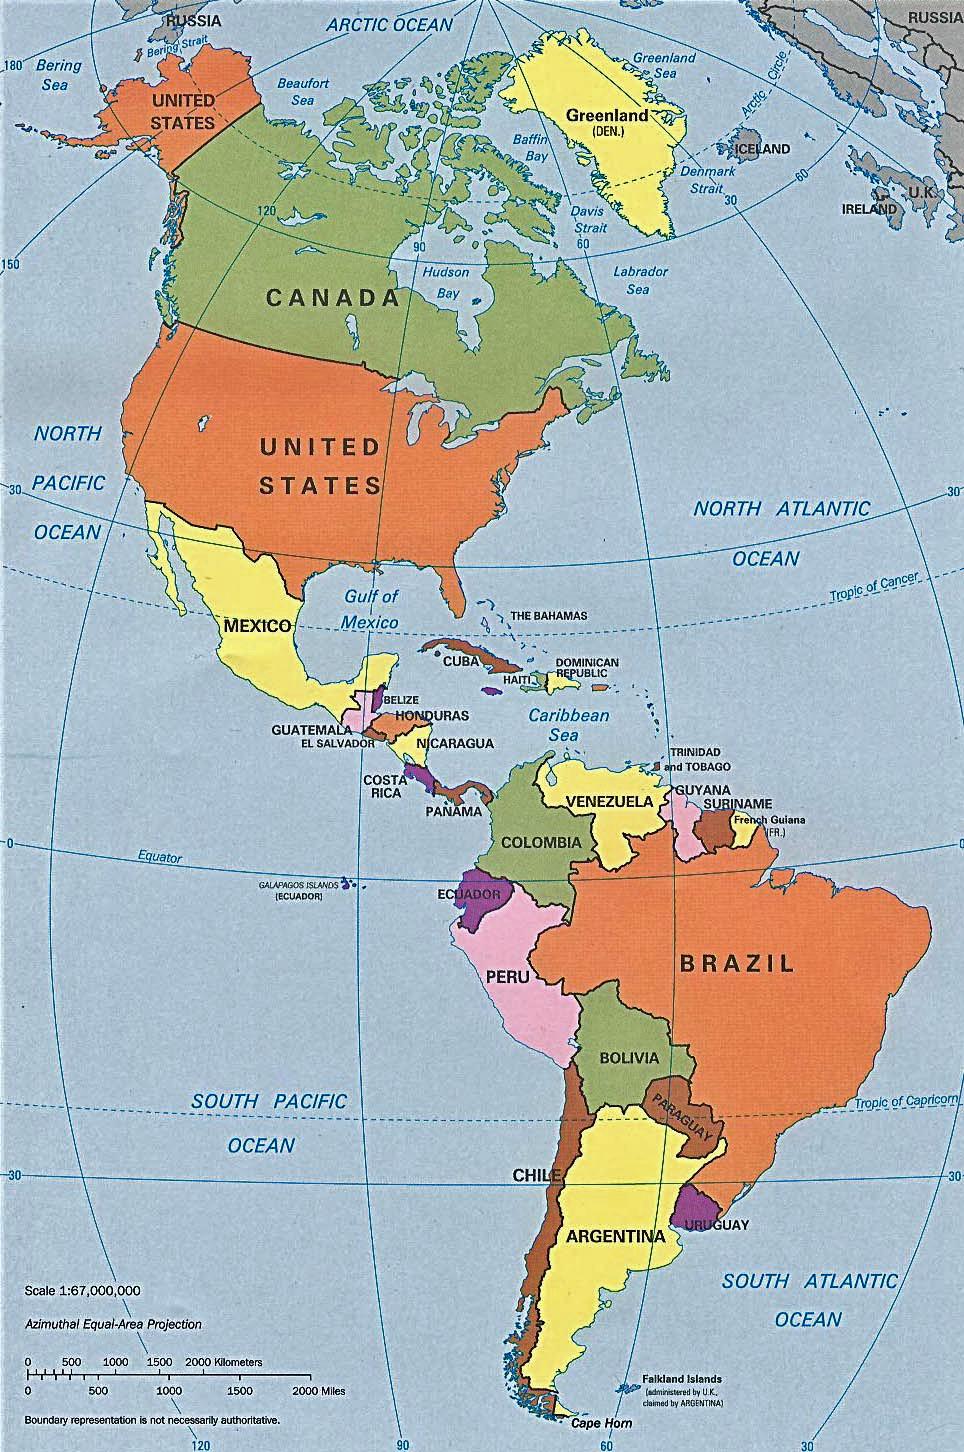 Letak Benua Amerika : letak, benua, amerika, Geografi, Benua, Amerika, Geografi.org